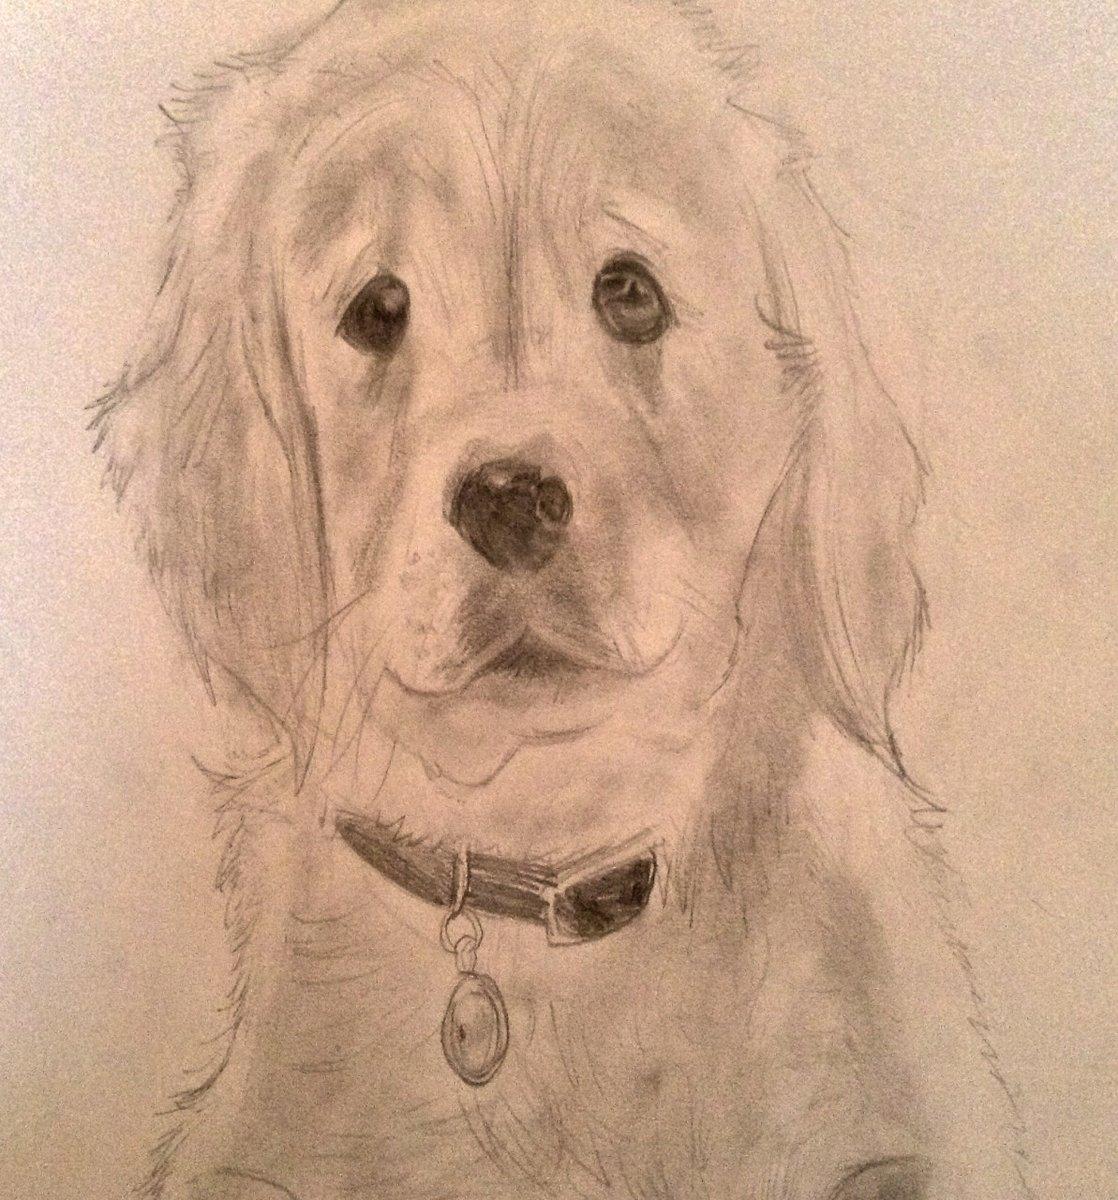 Golden Retriever puppy drawing.  #puppylove #puppy #GoldenRetriever #cute #Artworks #dog #canine #pencilart